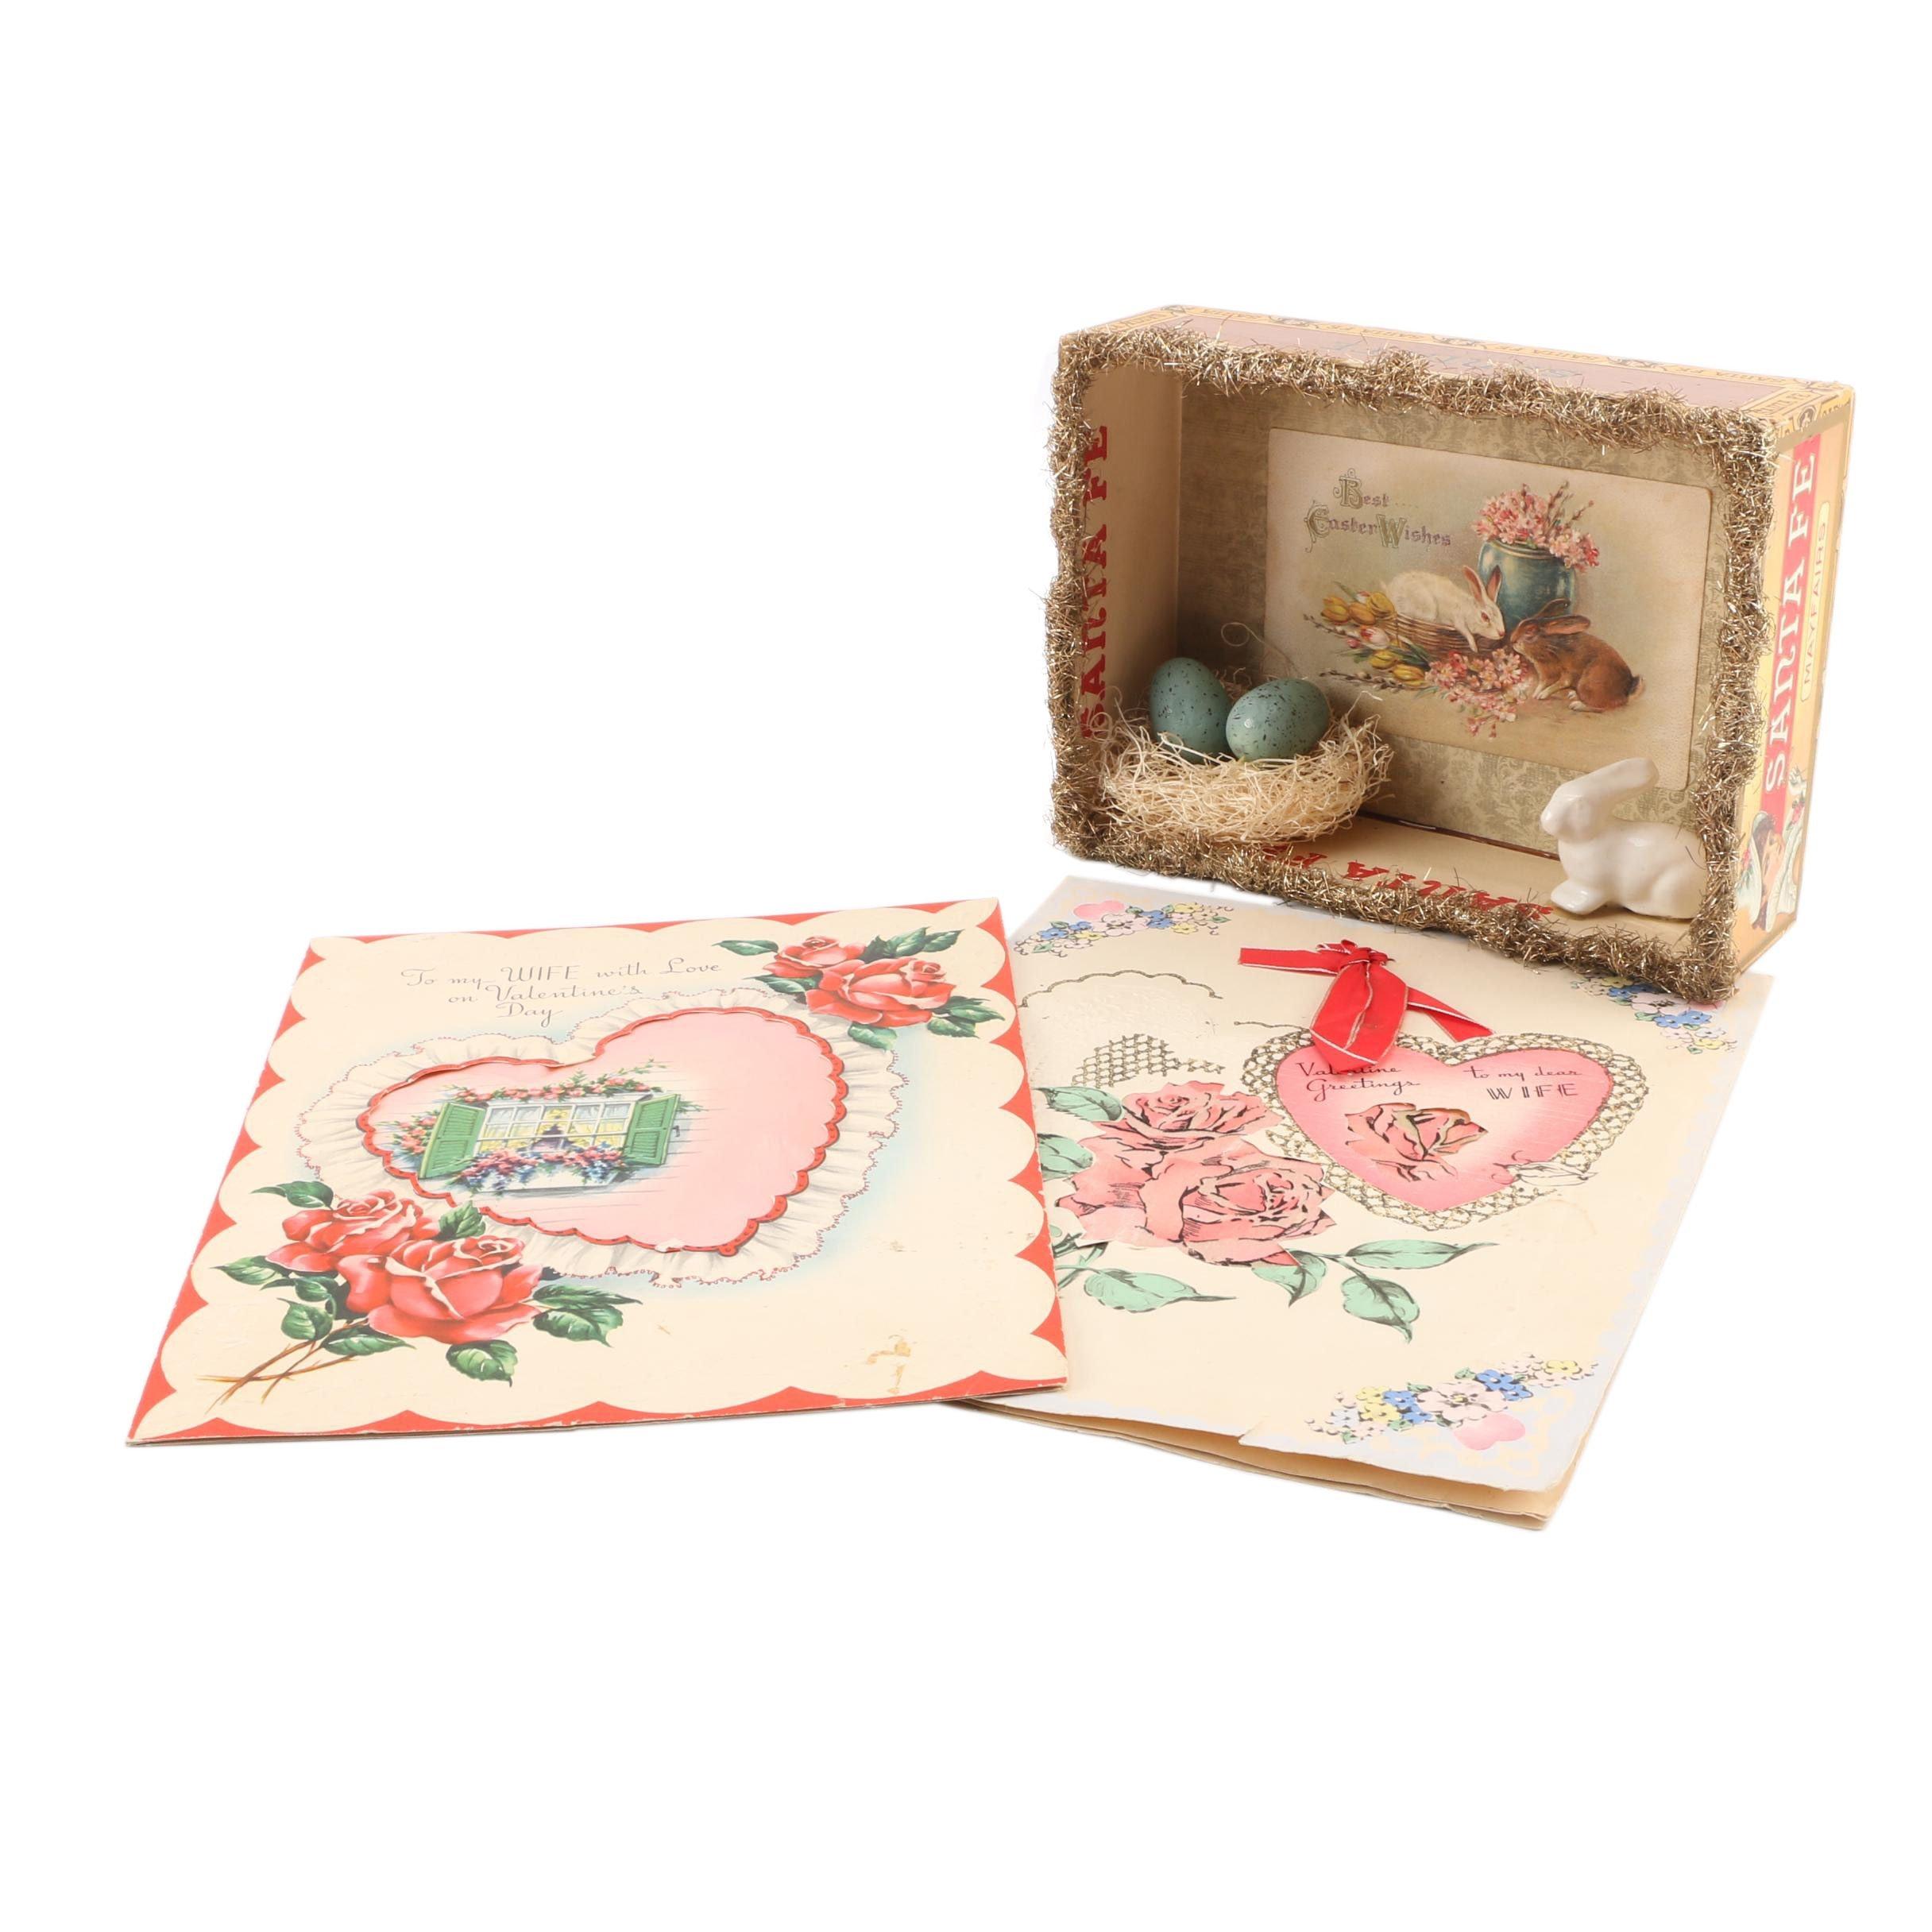 Vintage Valentine's Day and Handmade Easter Vignette Decor